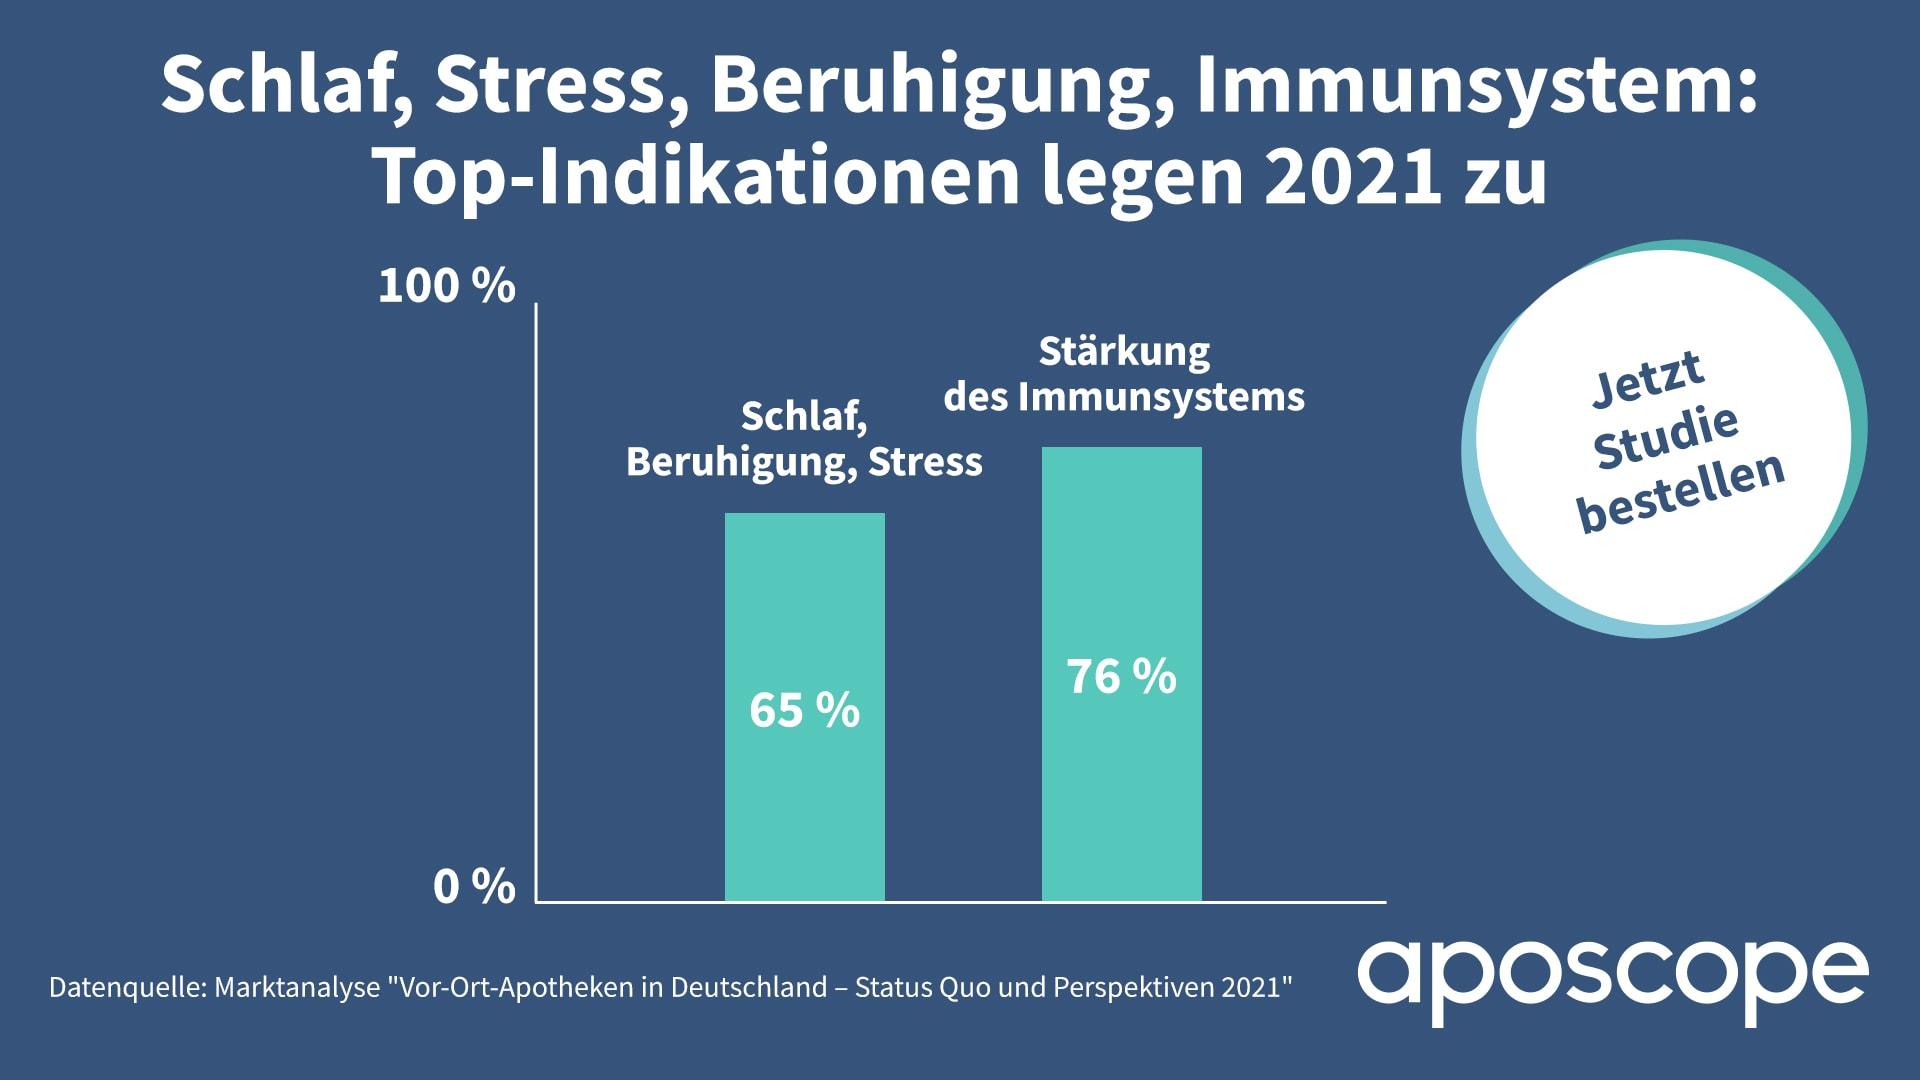 aposcope_Säulendiagramm_Top-Indikationen 2021_1920x1080px